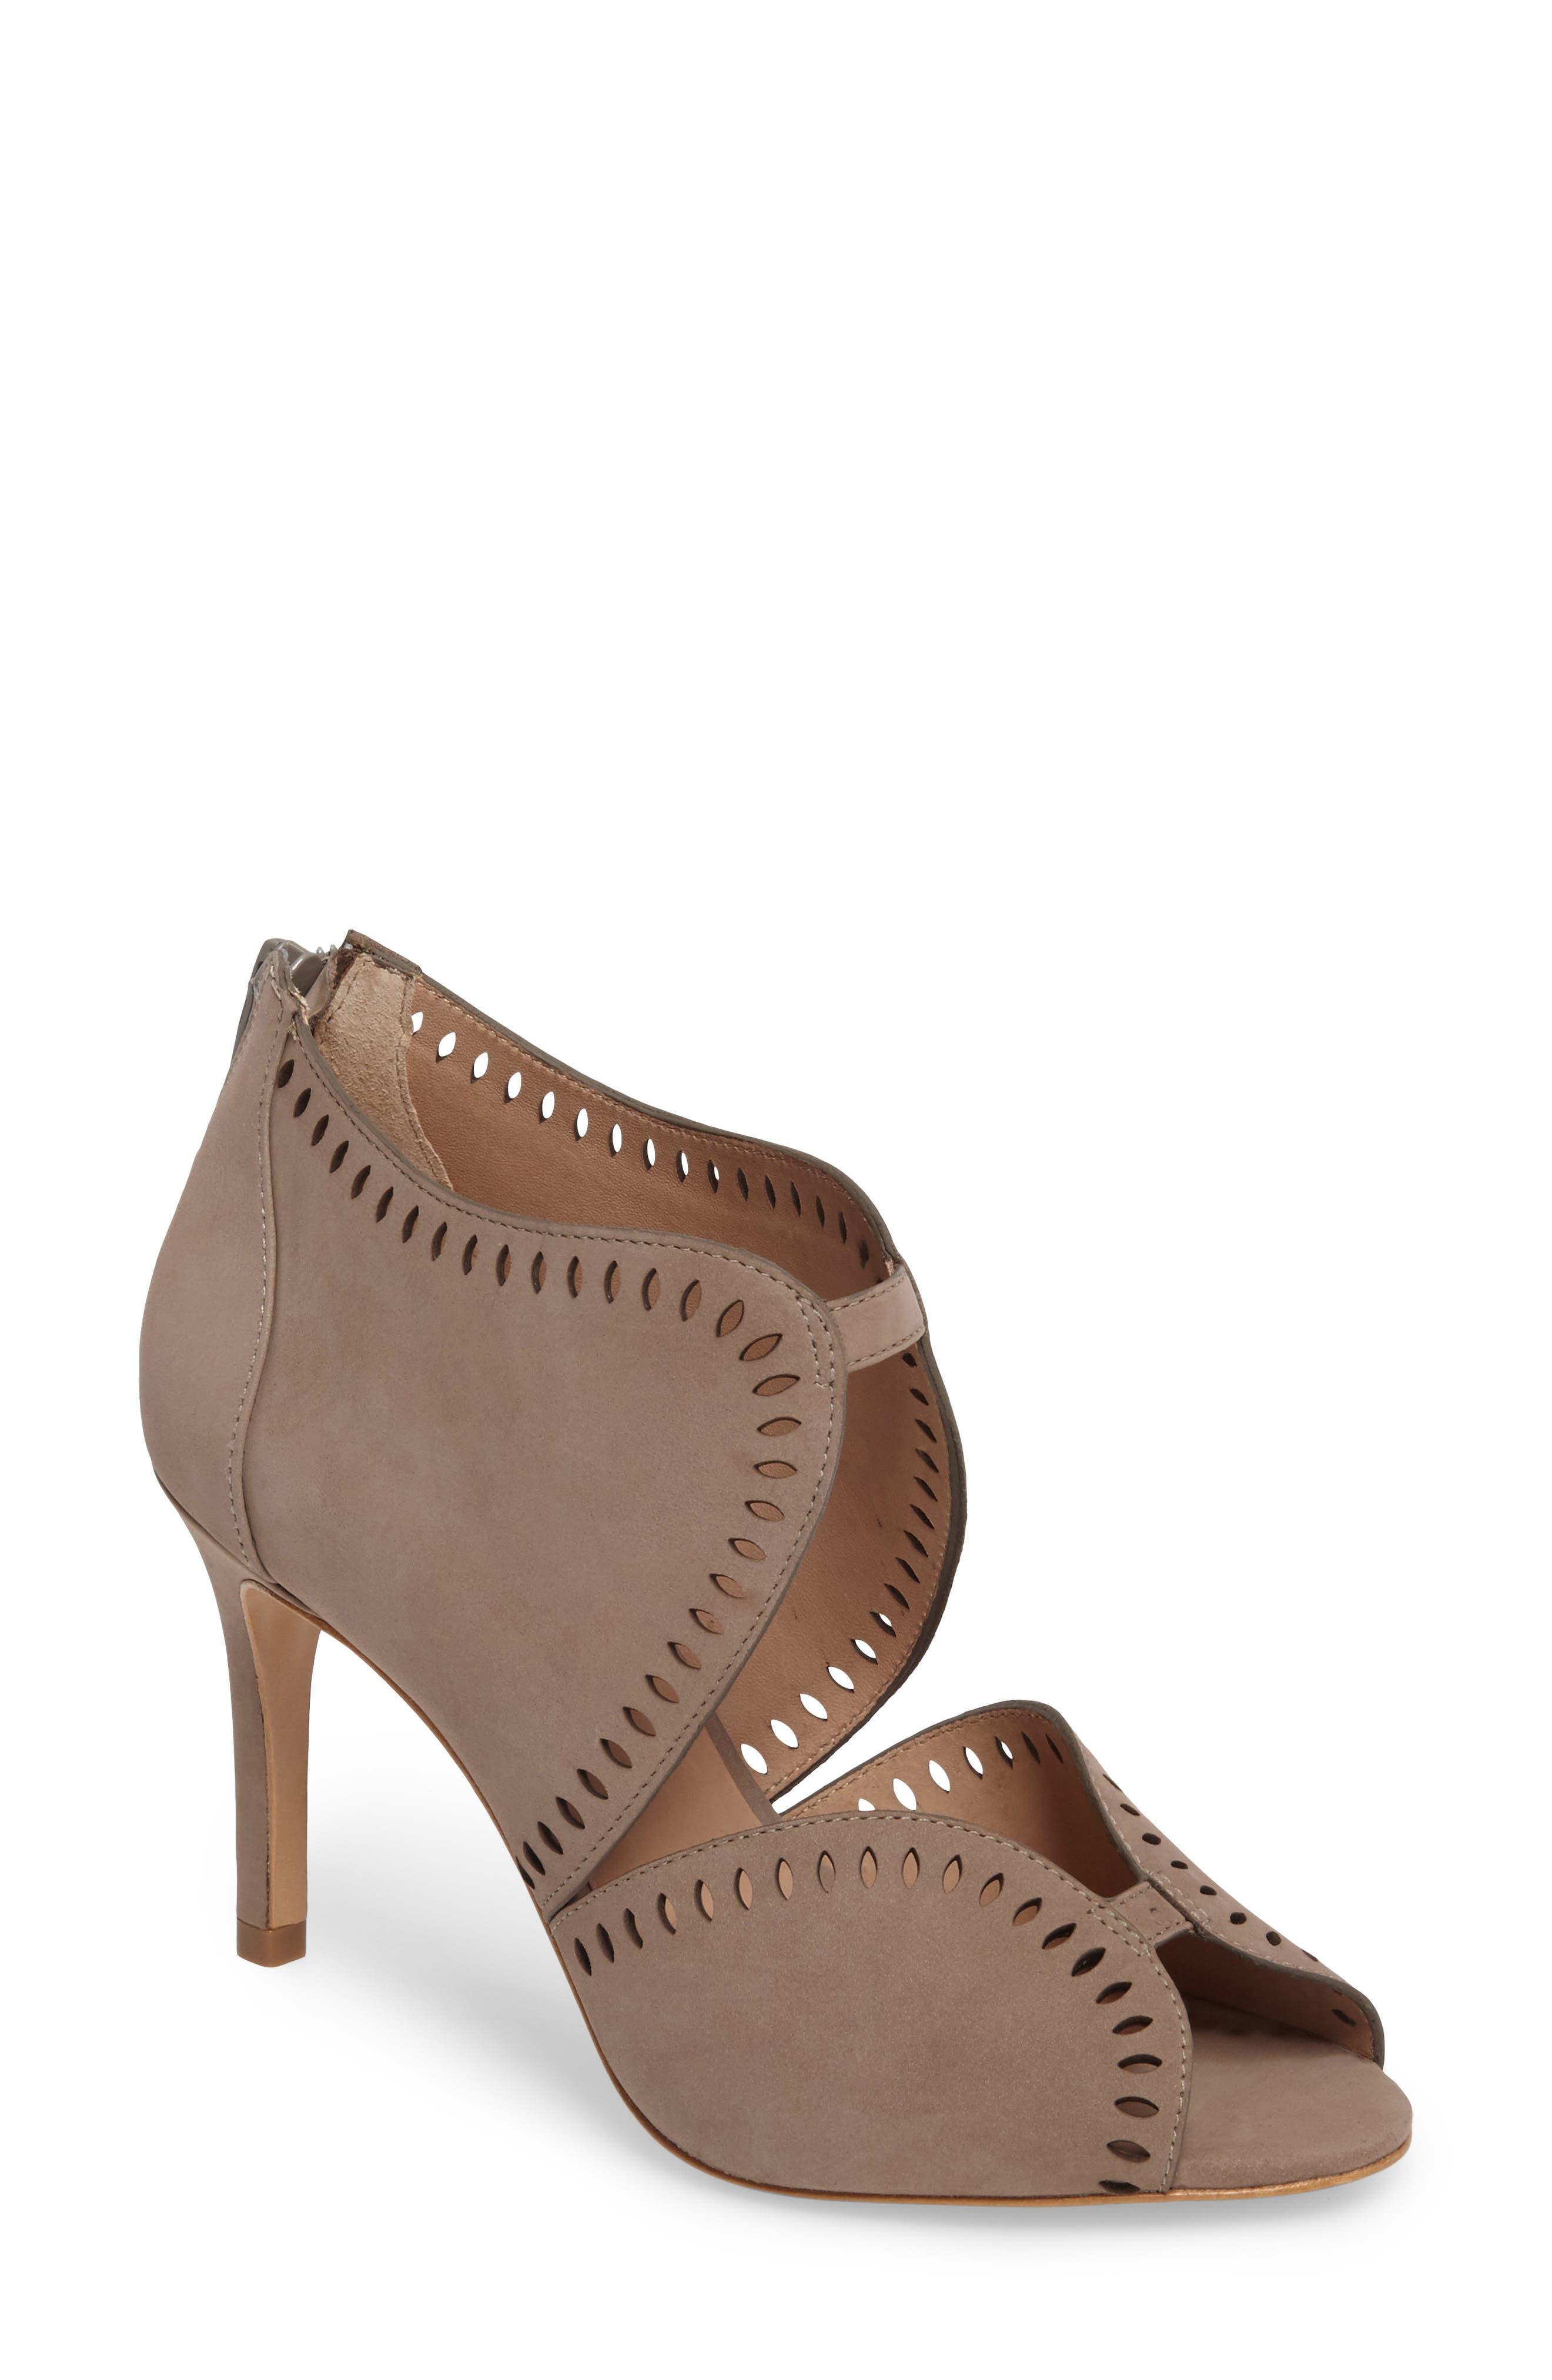 Alternate Image 1 Selected - Klub Nico Mallia Perforated Sandal (Women)